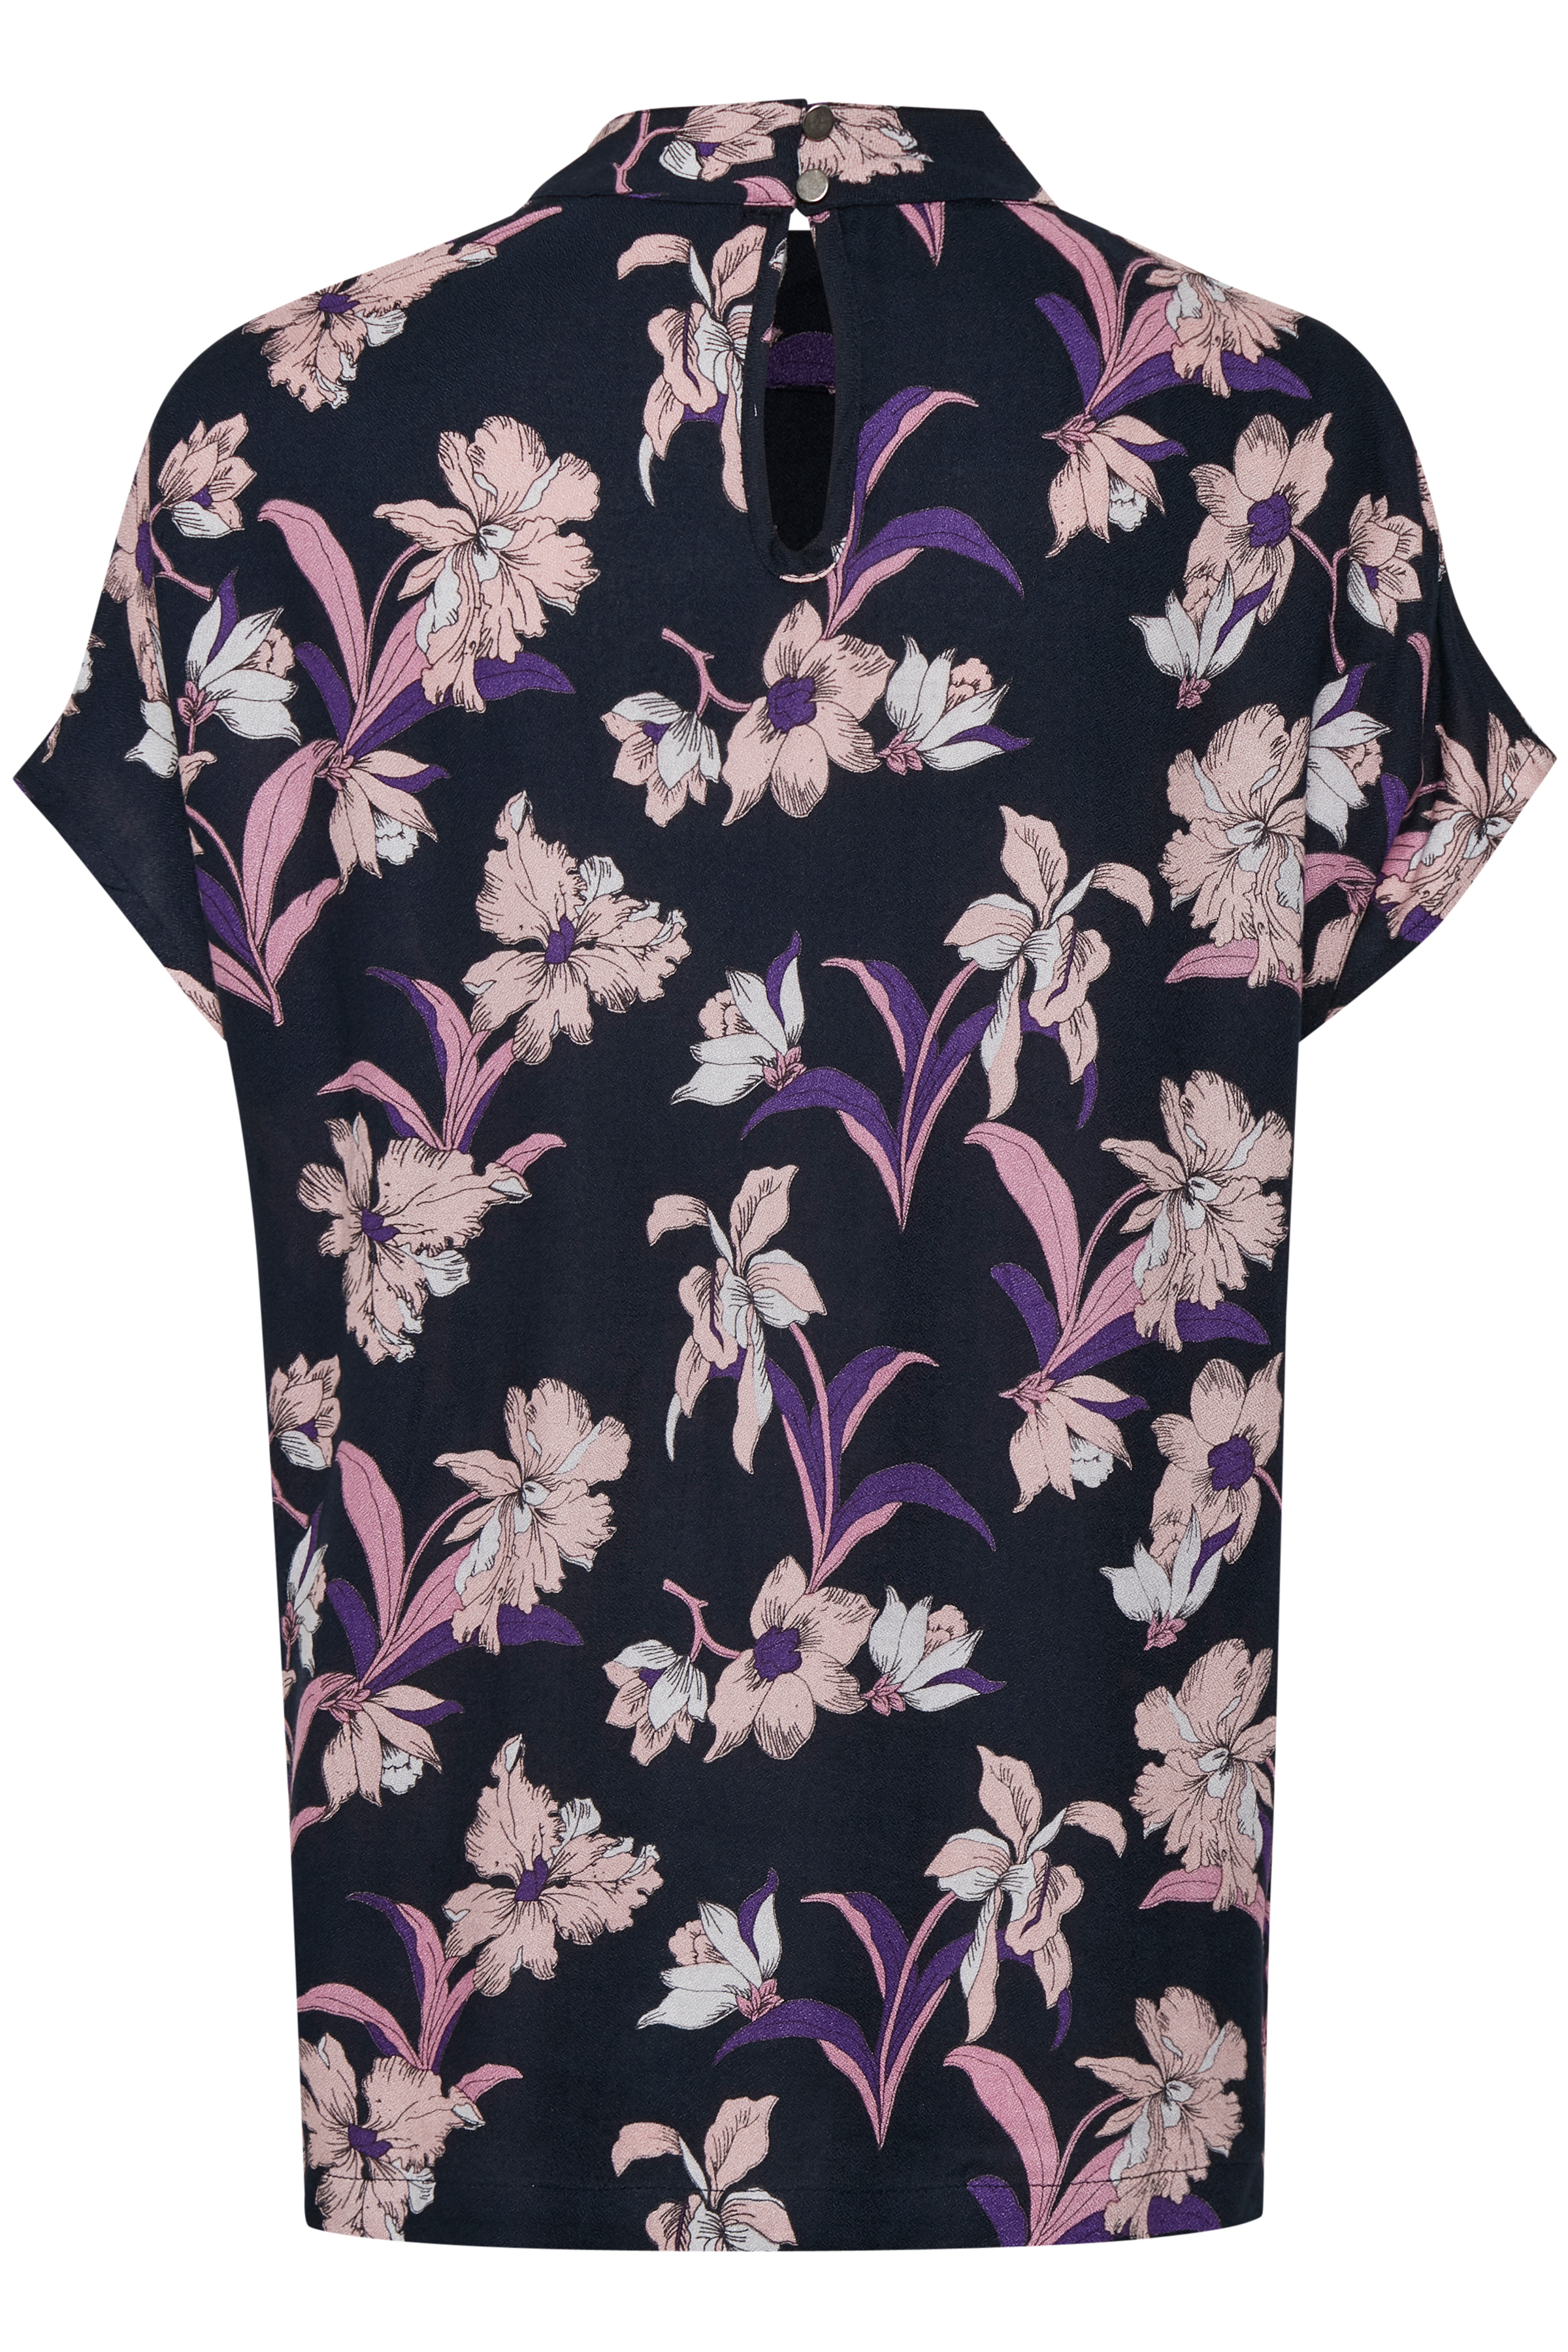 Marineblau/rosa Kurzarm-Bluse  von Kaffe – Shoppen Sie Marineblau/rosa Kurzarm-Bluse  ab Gr. 34-46 hier